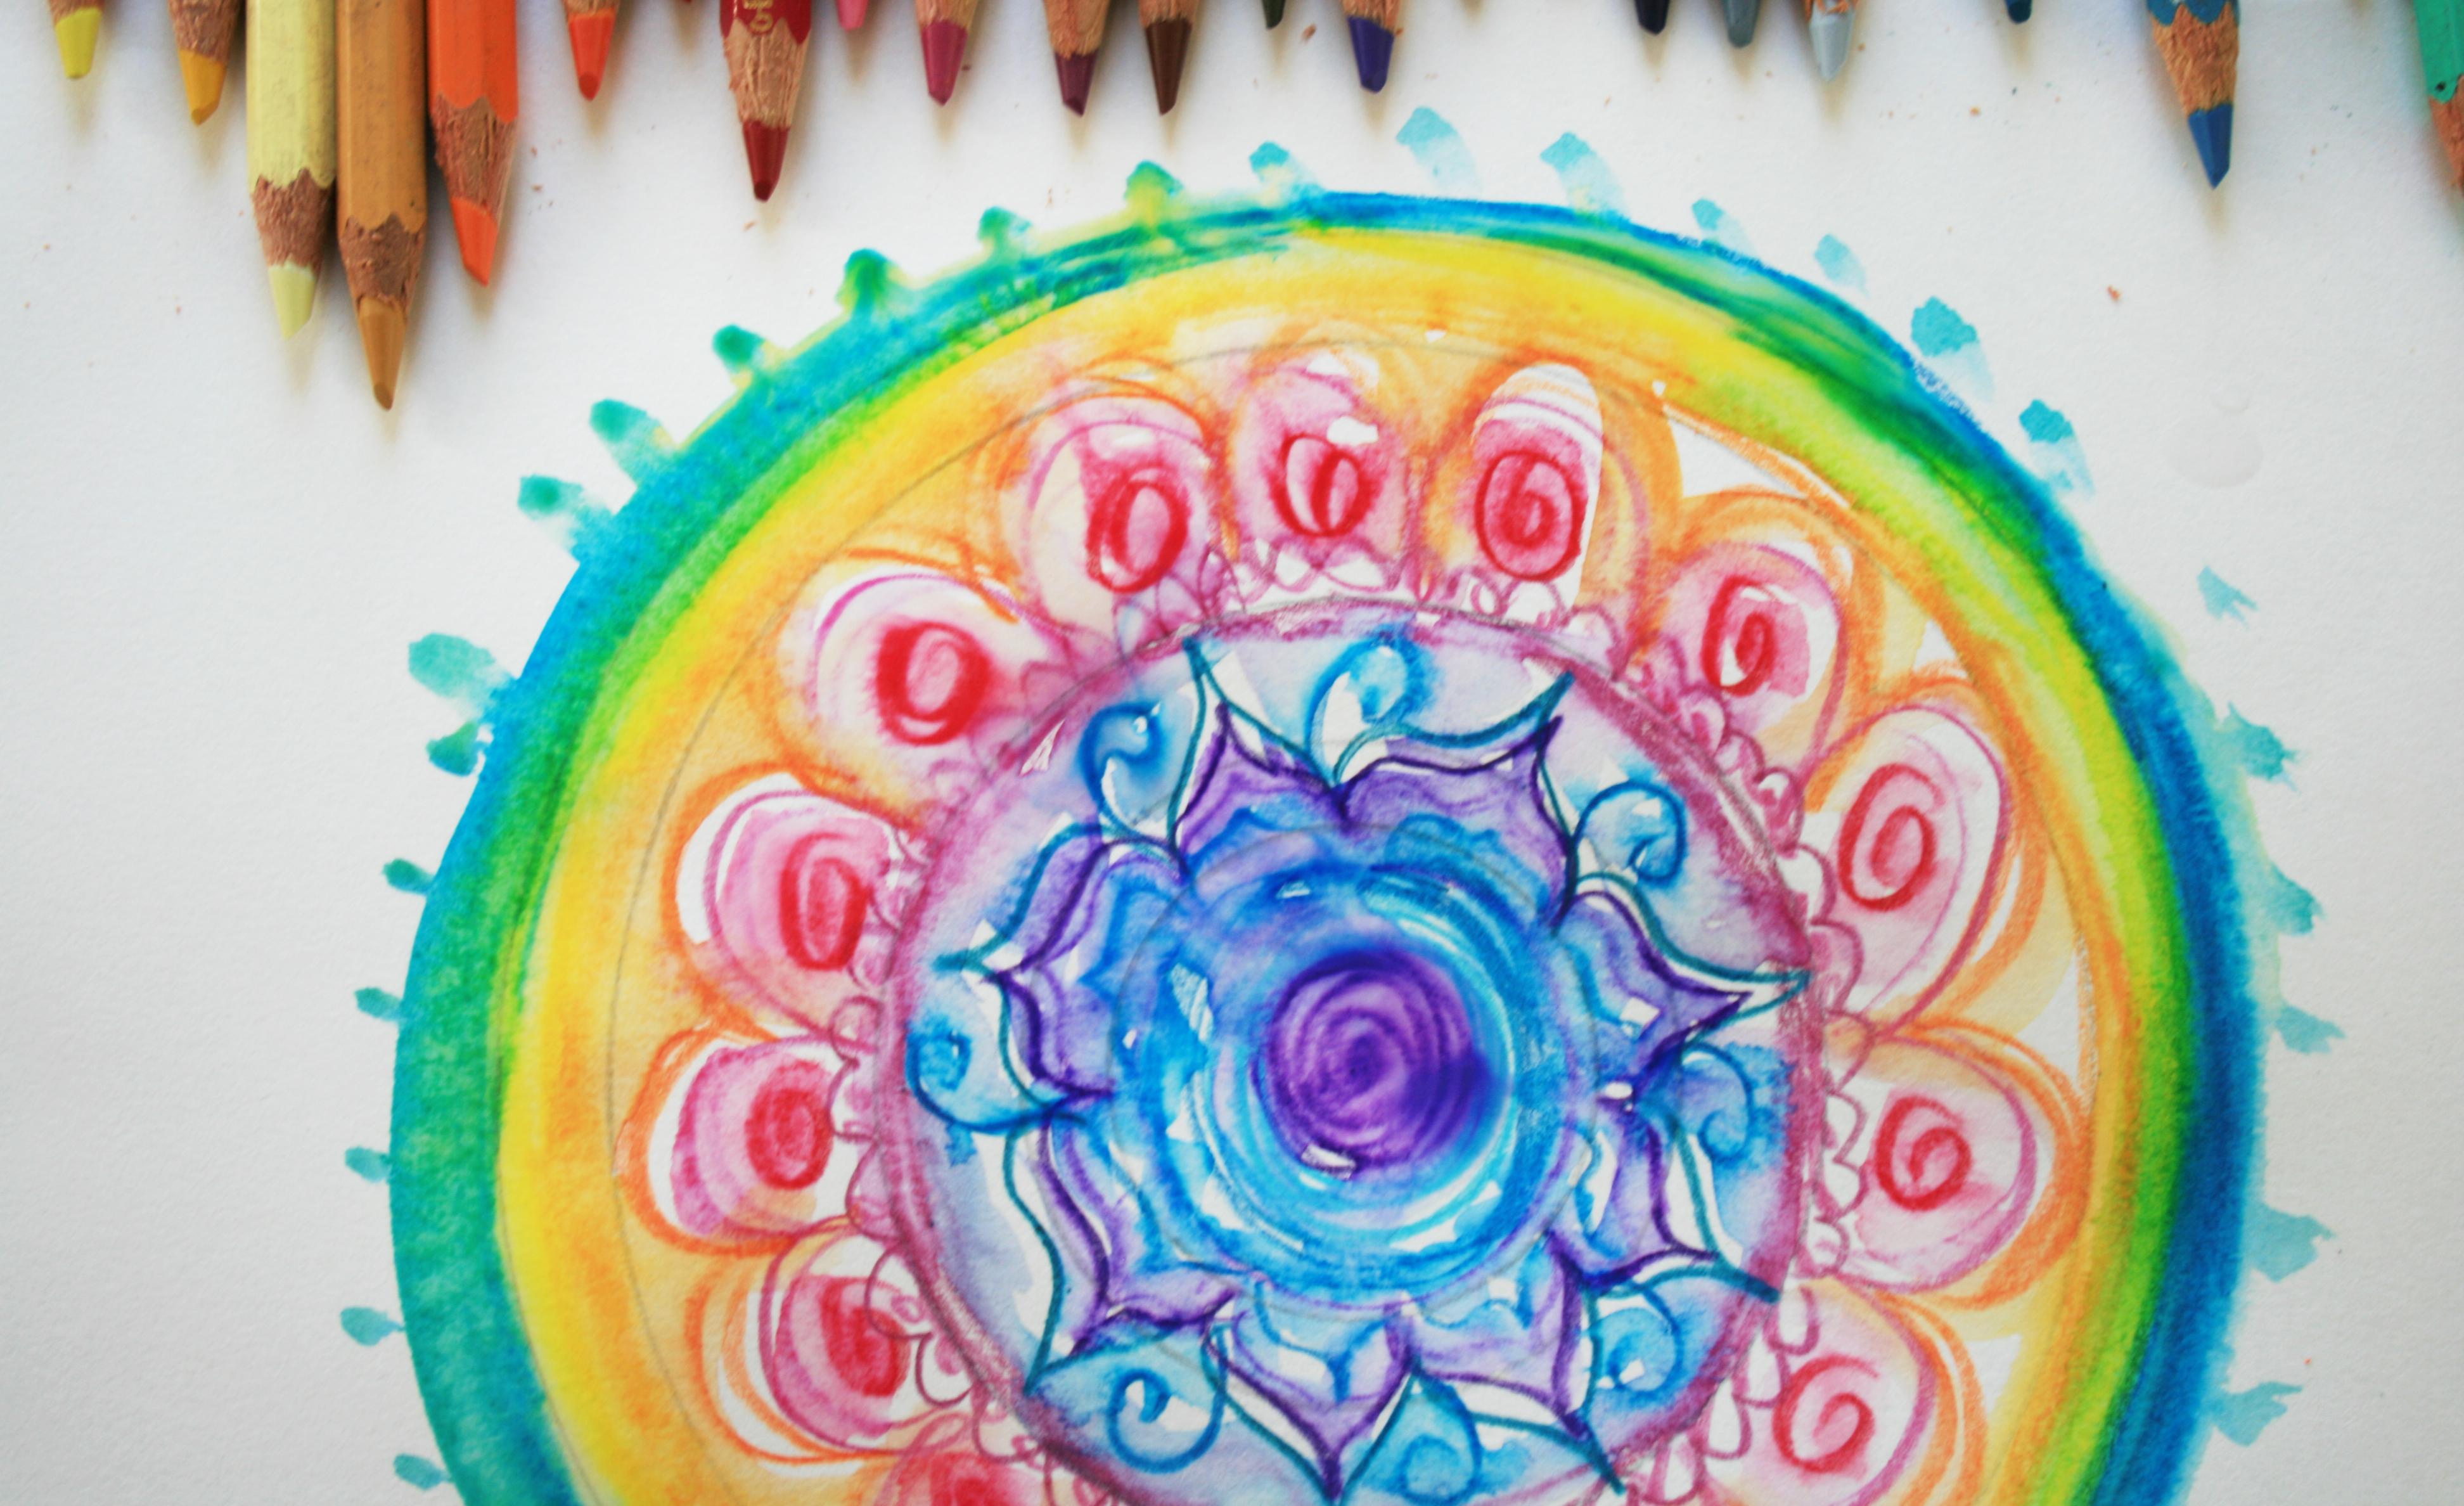 Color art mandala wonders - Draw And Color Expressive Mandala Art Mandala I